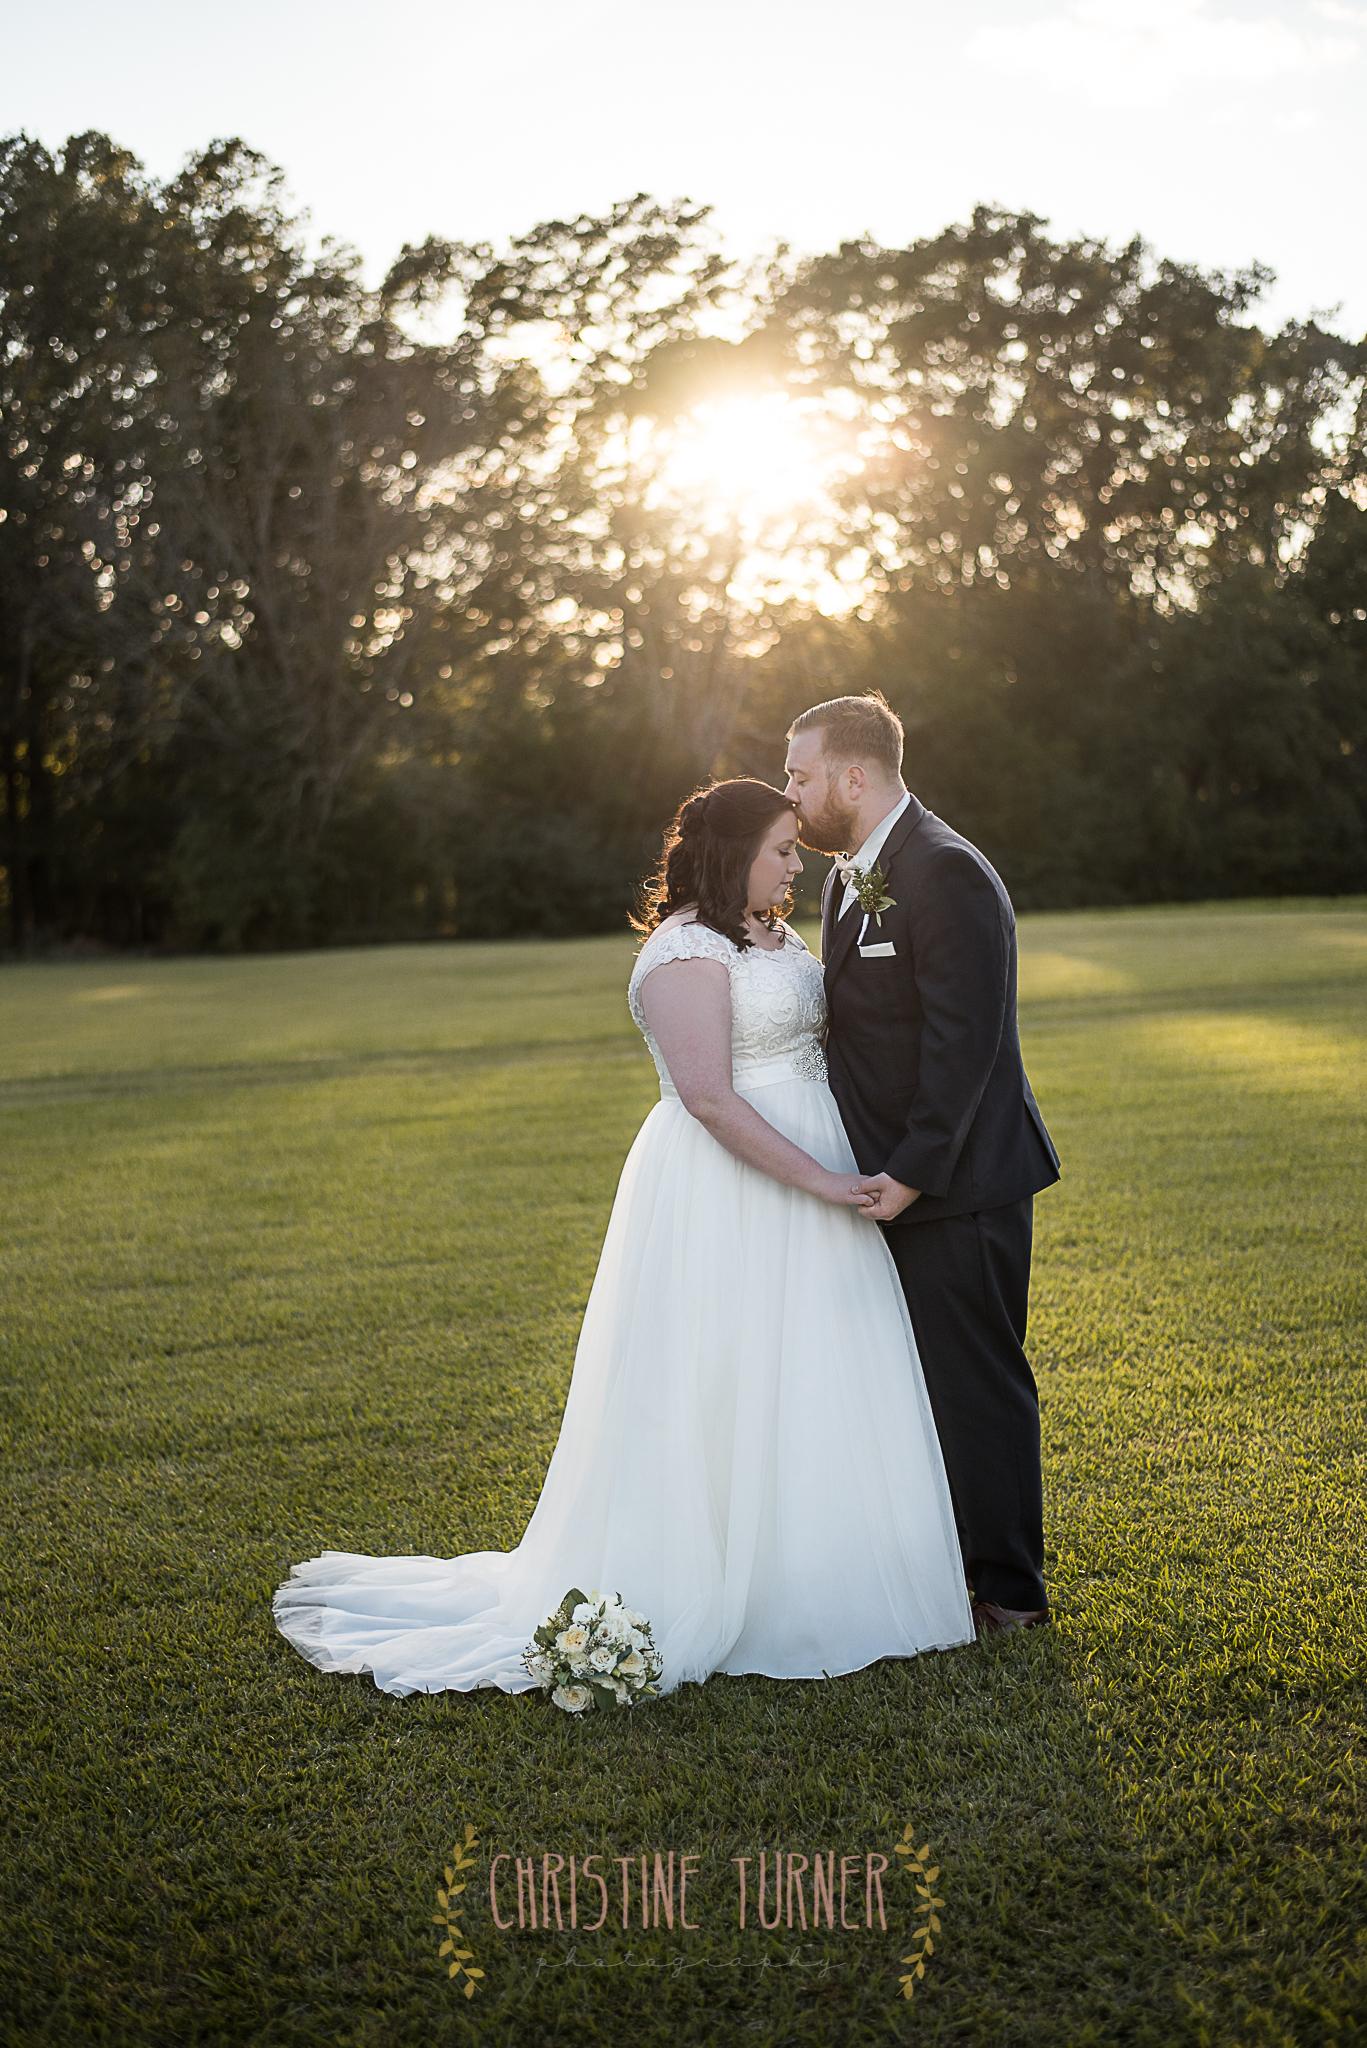 J&D Wedding (9 of 24)